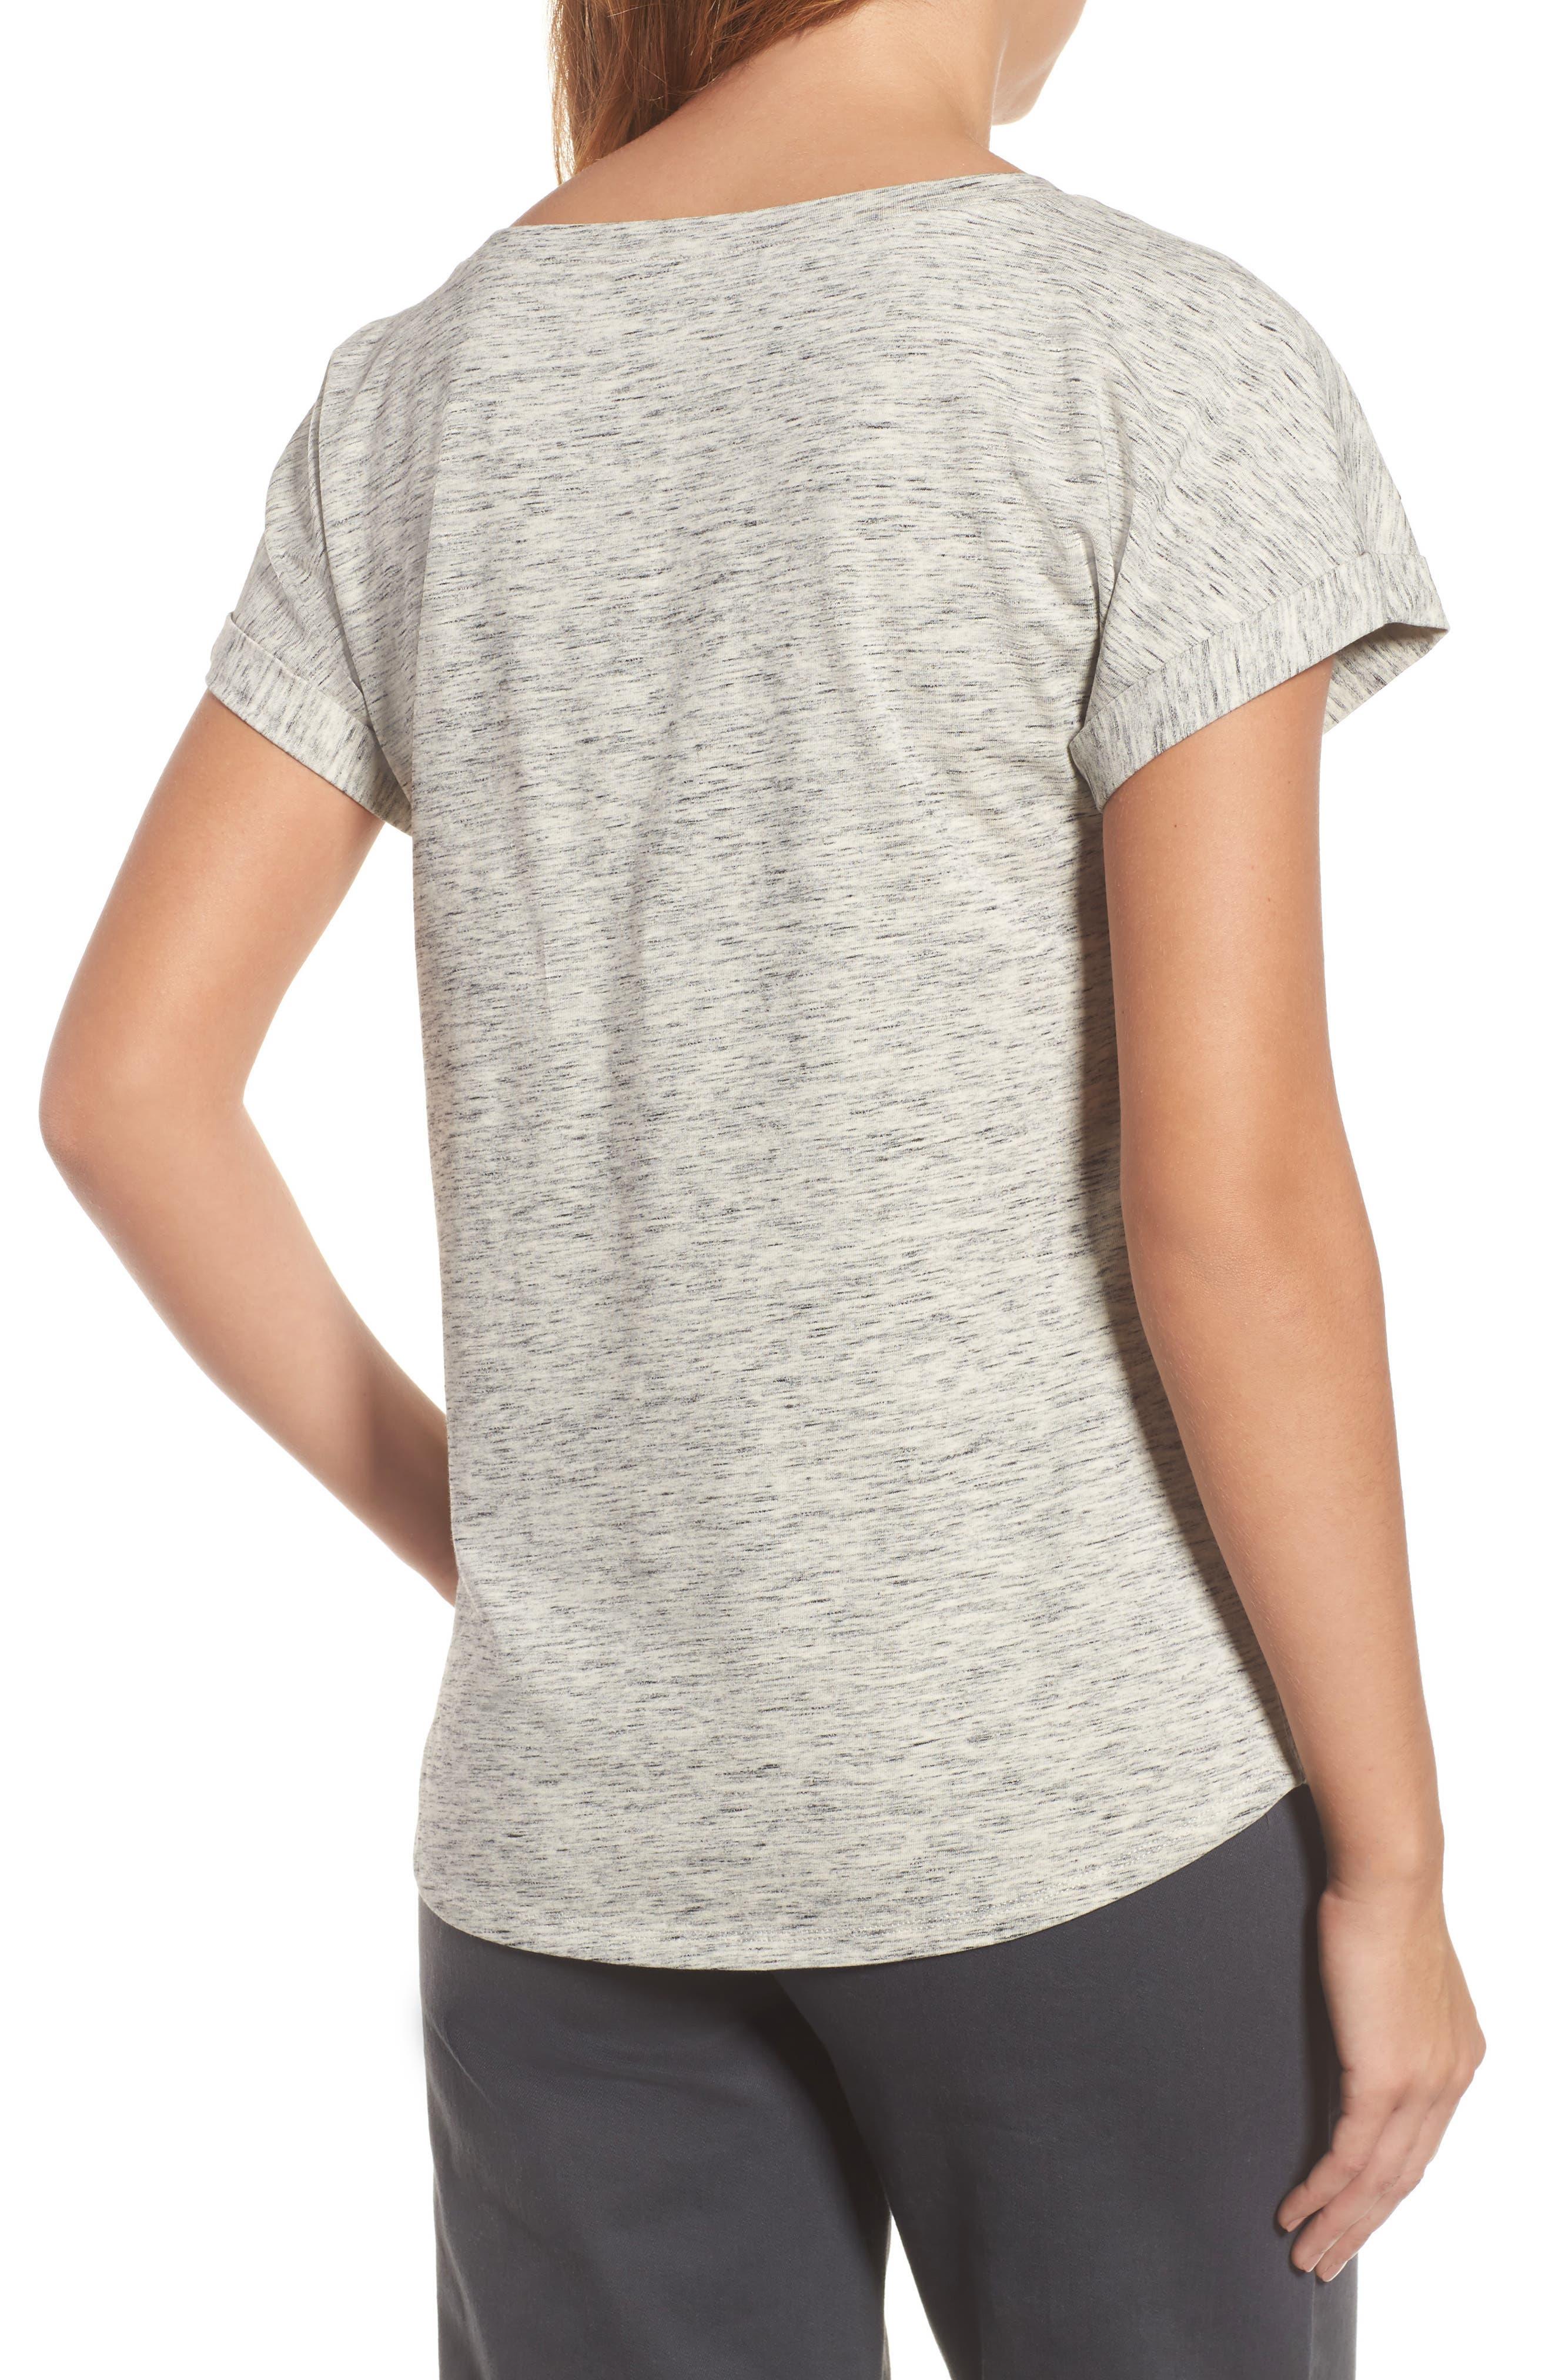 Alternate Image 2  - NIC+ZOE Henna Short Sleeve Top (Regular & Petite)